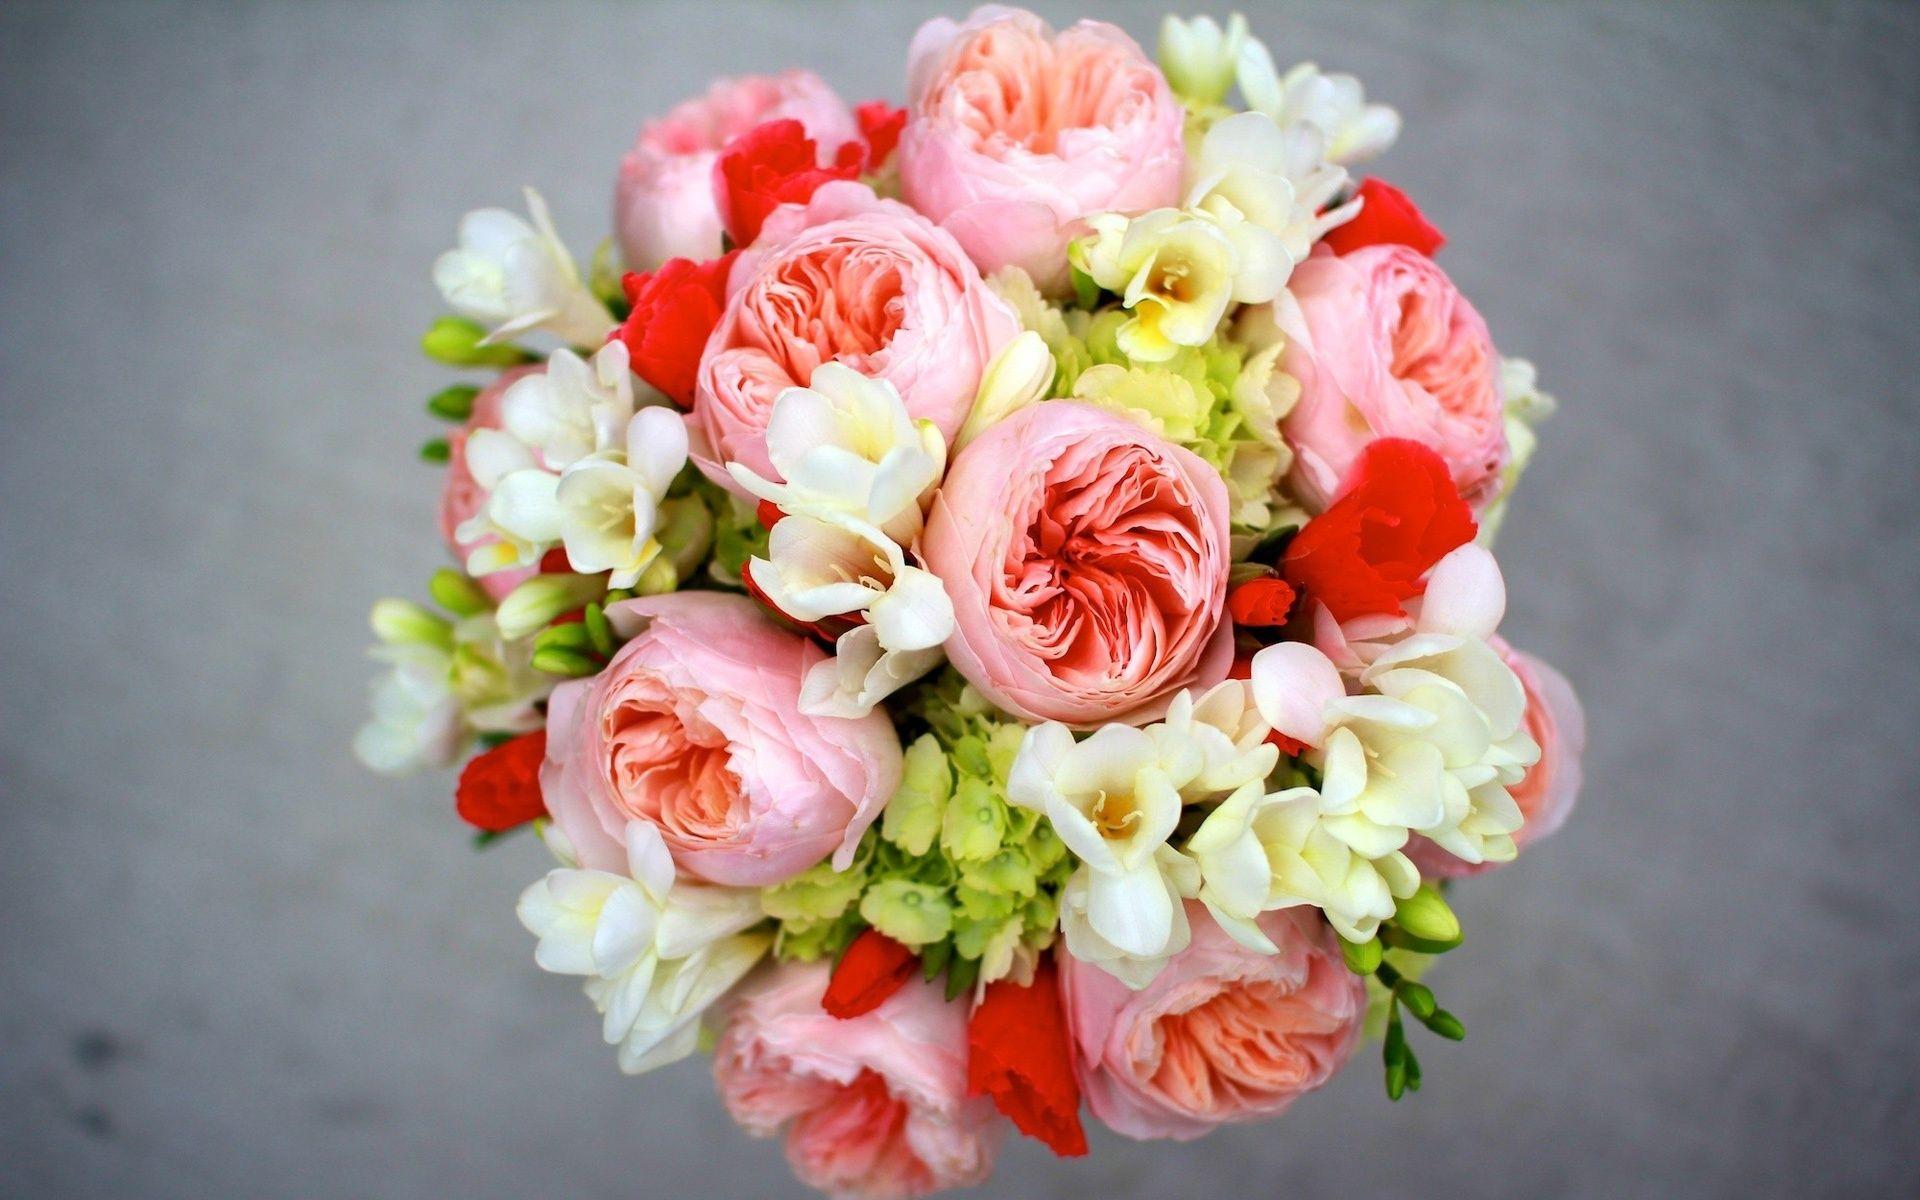 Pivoine Freesia Hortensia Bouquet De Fleurs Fonds D Ecran